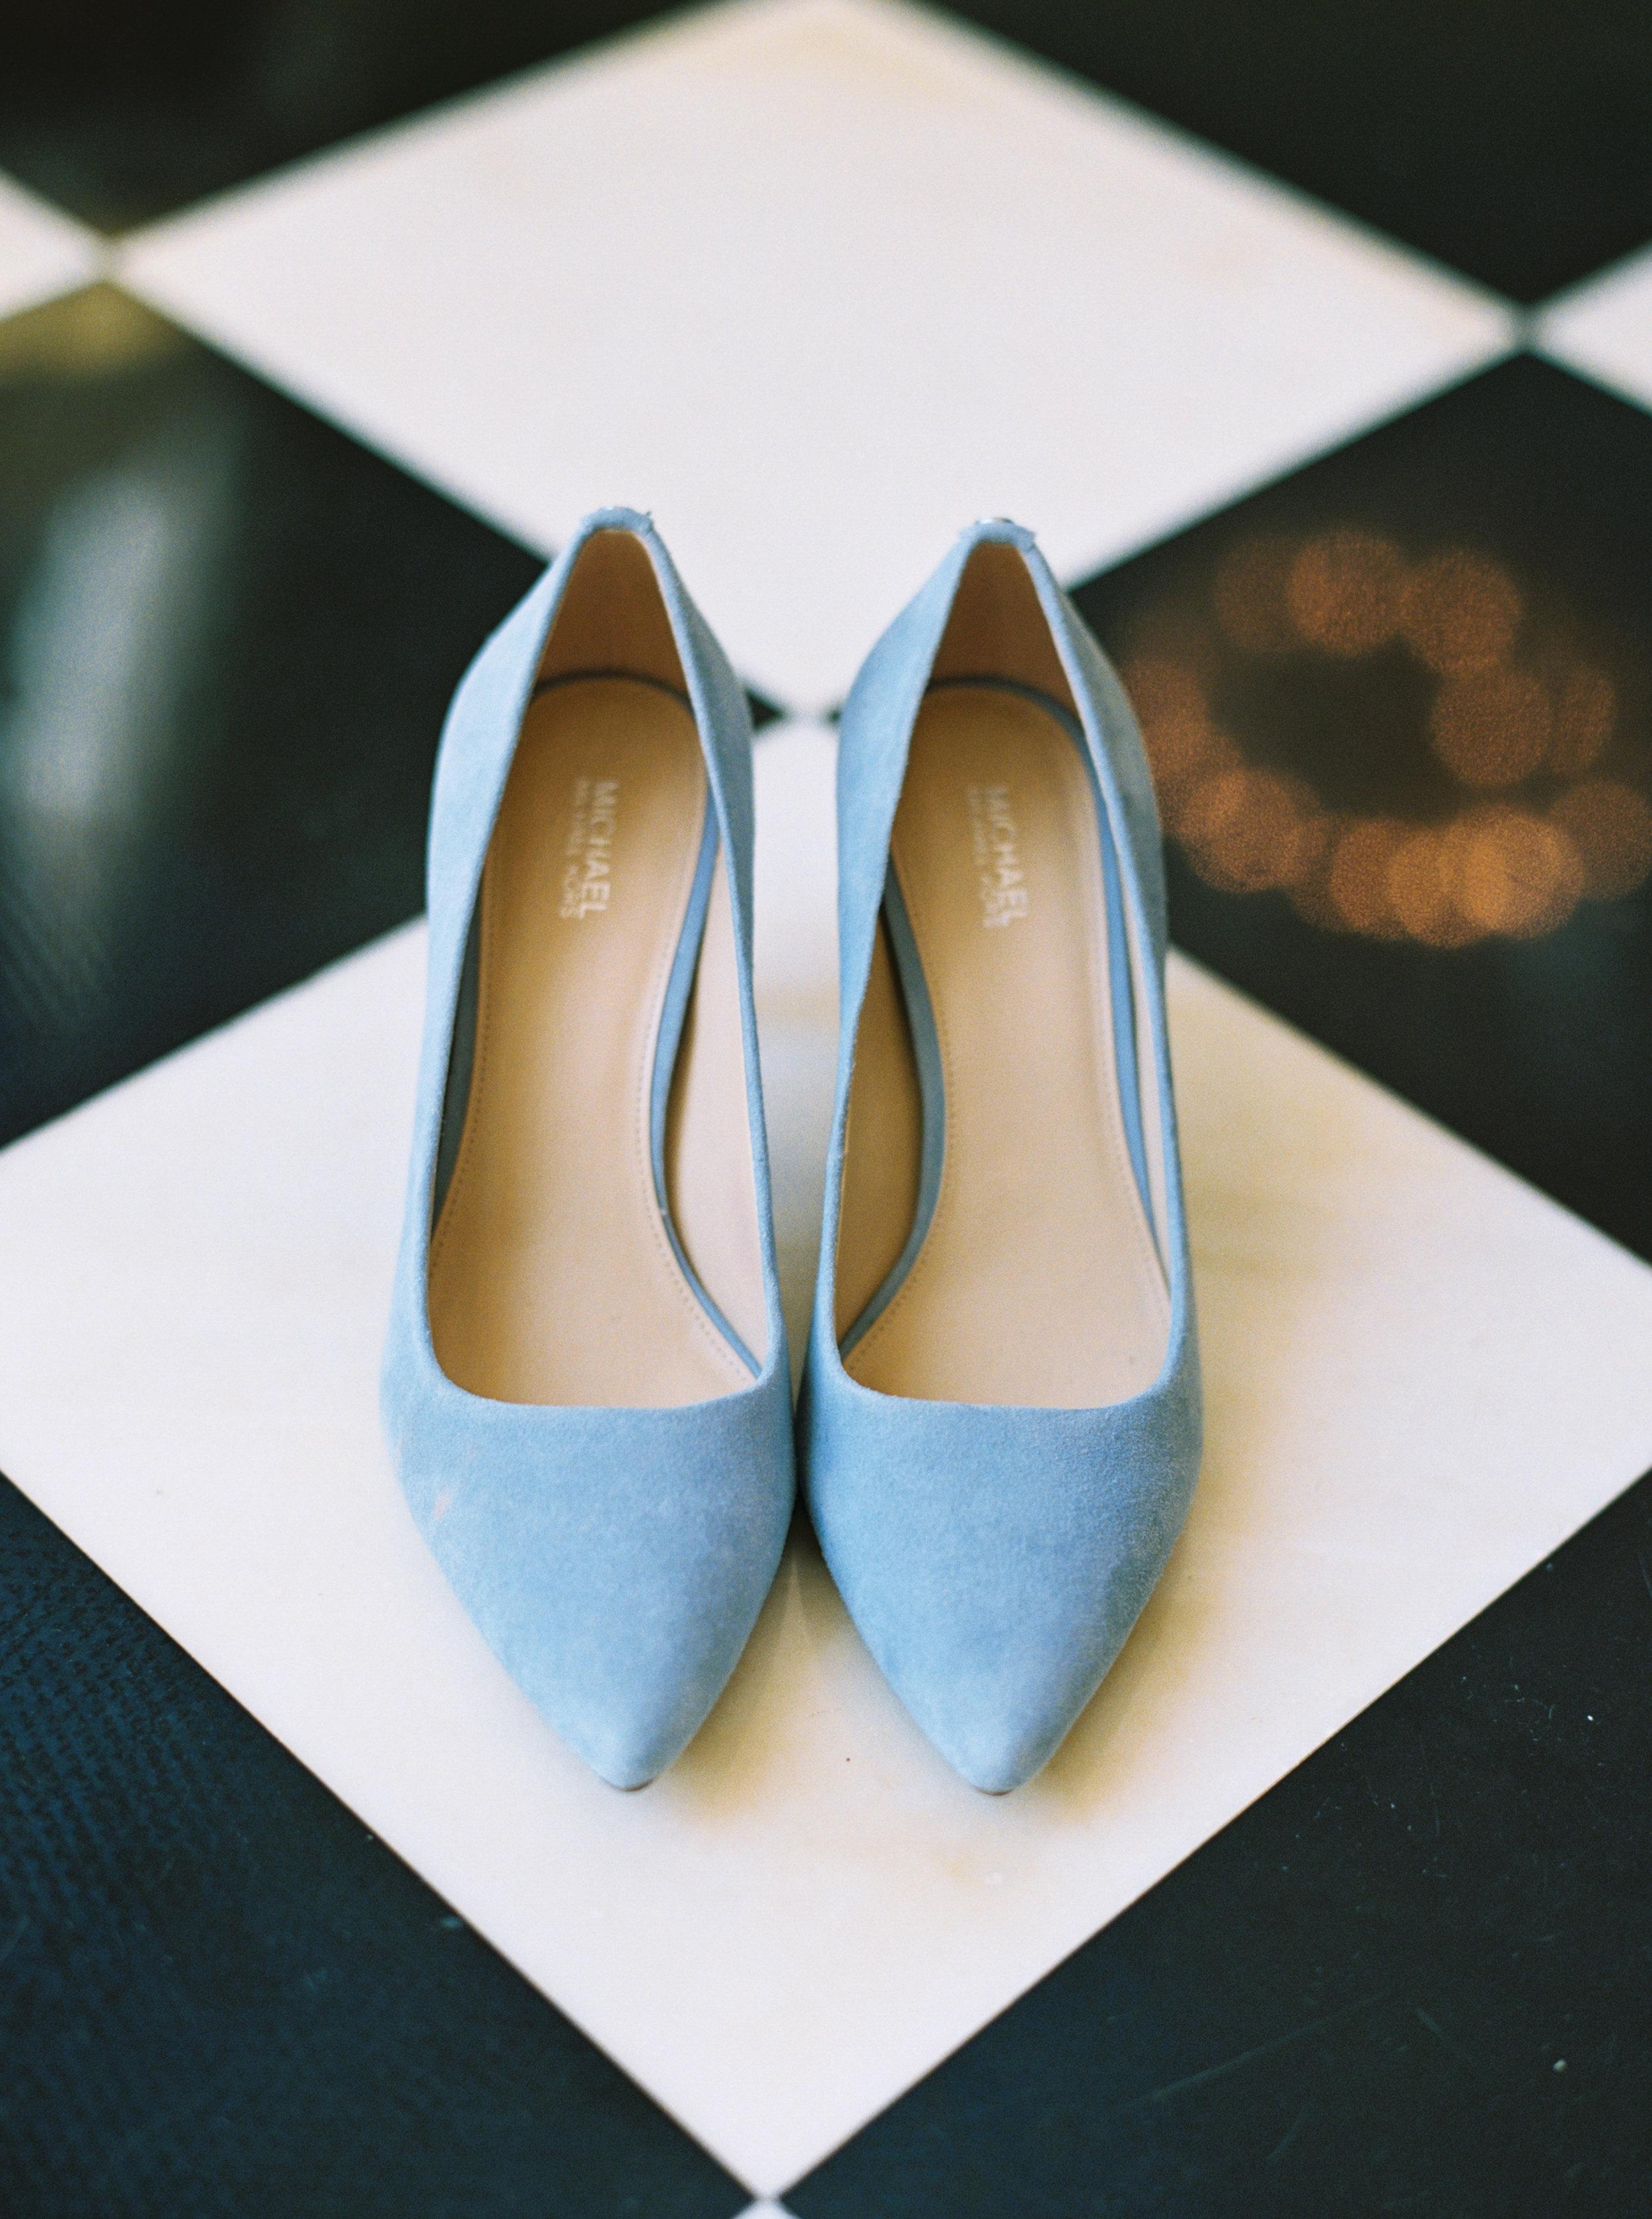 Marie_Perry_Duke_Mansion_Wedding_Charlotte_NC_Abigail_Malone_Photography-19.jpg